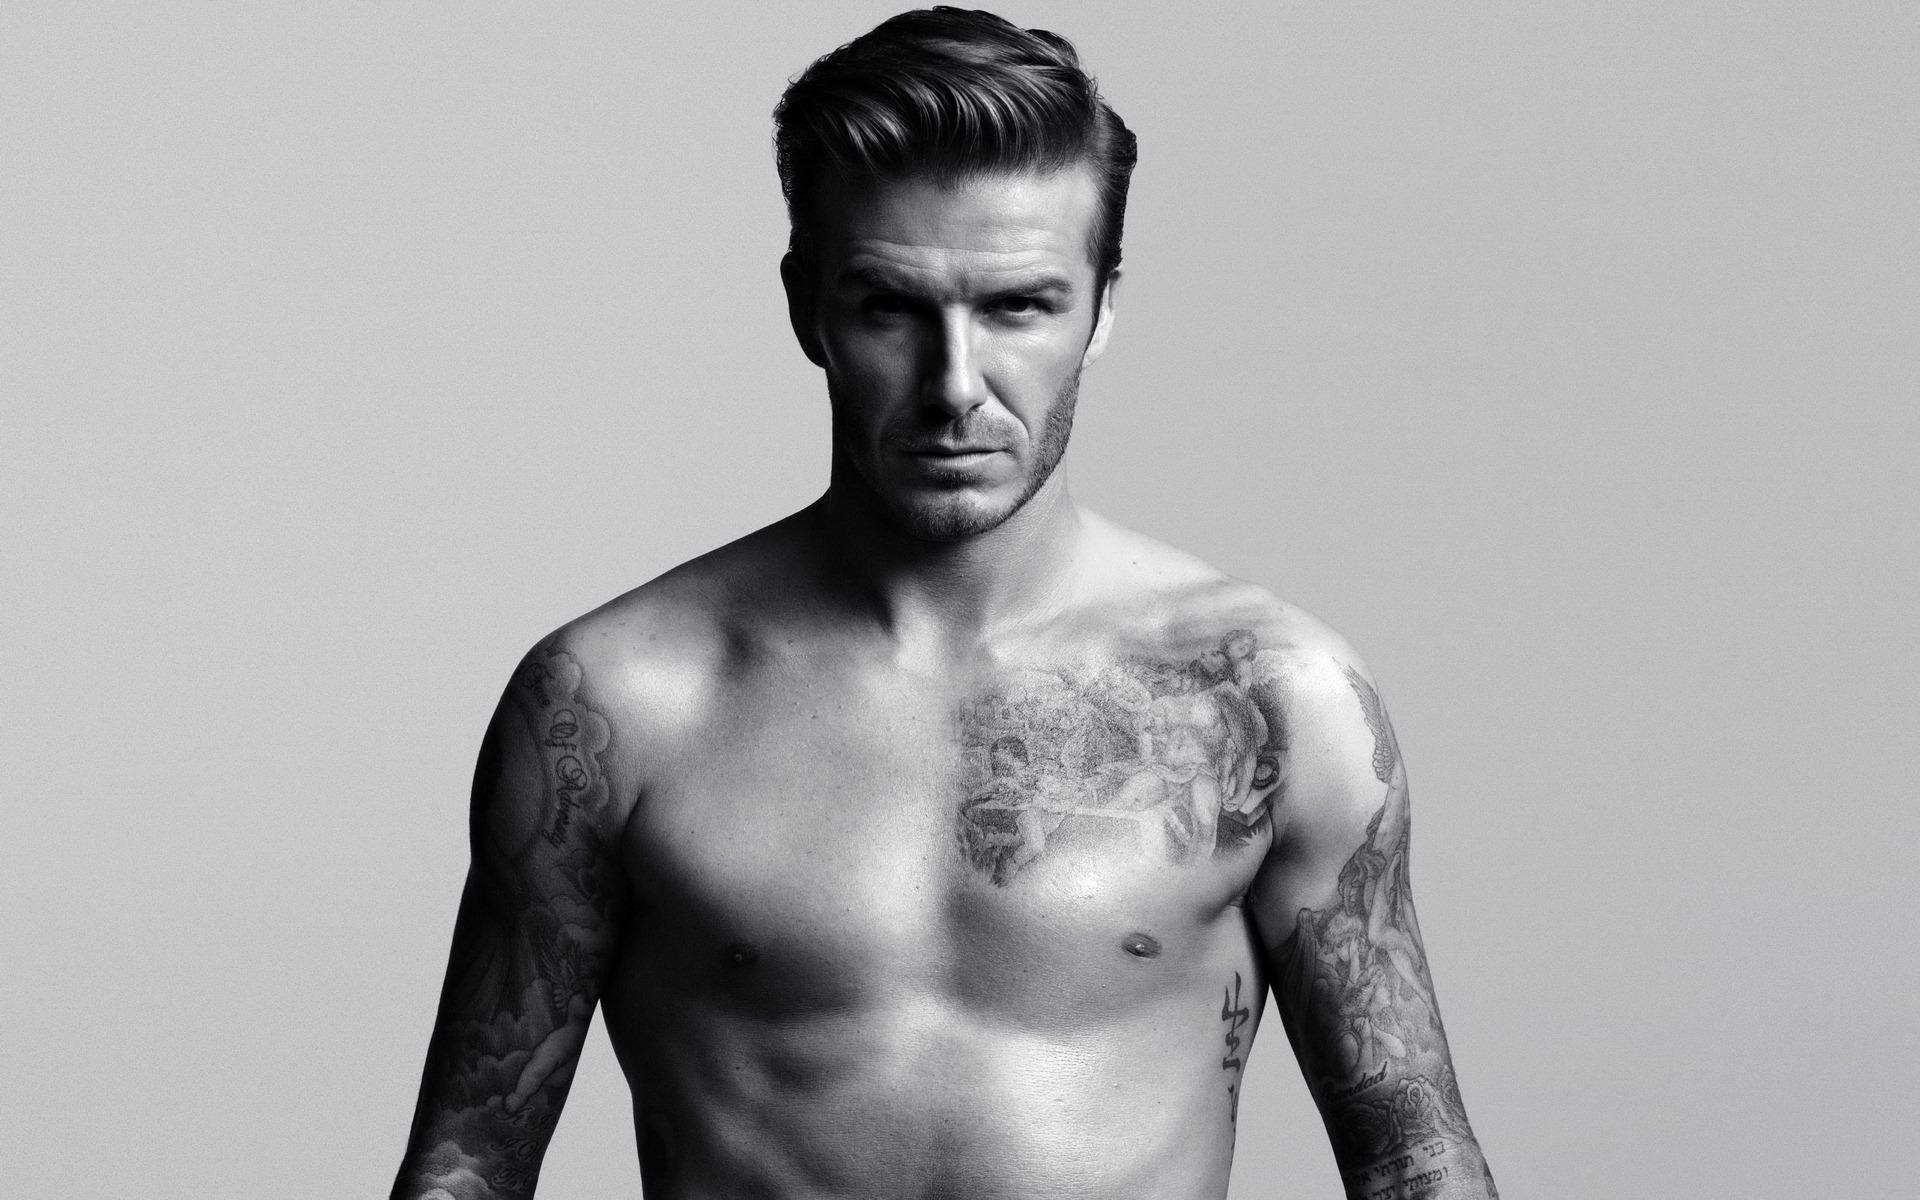 David Beckham in intimo per H&M [FOTO]